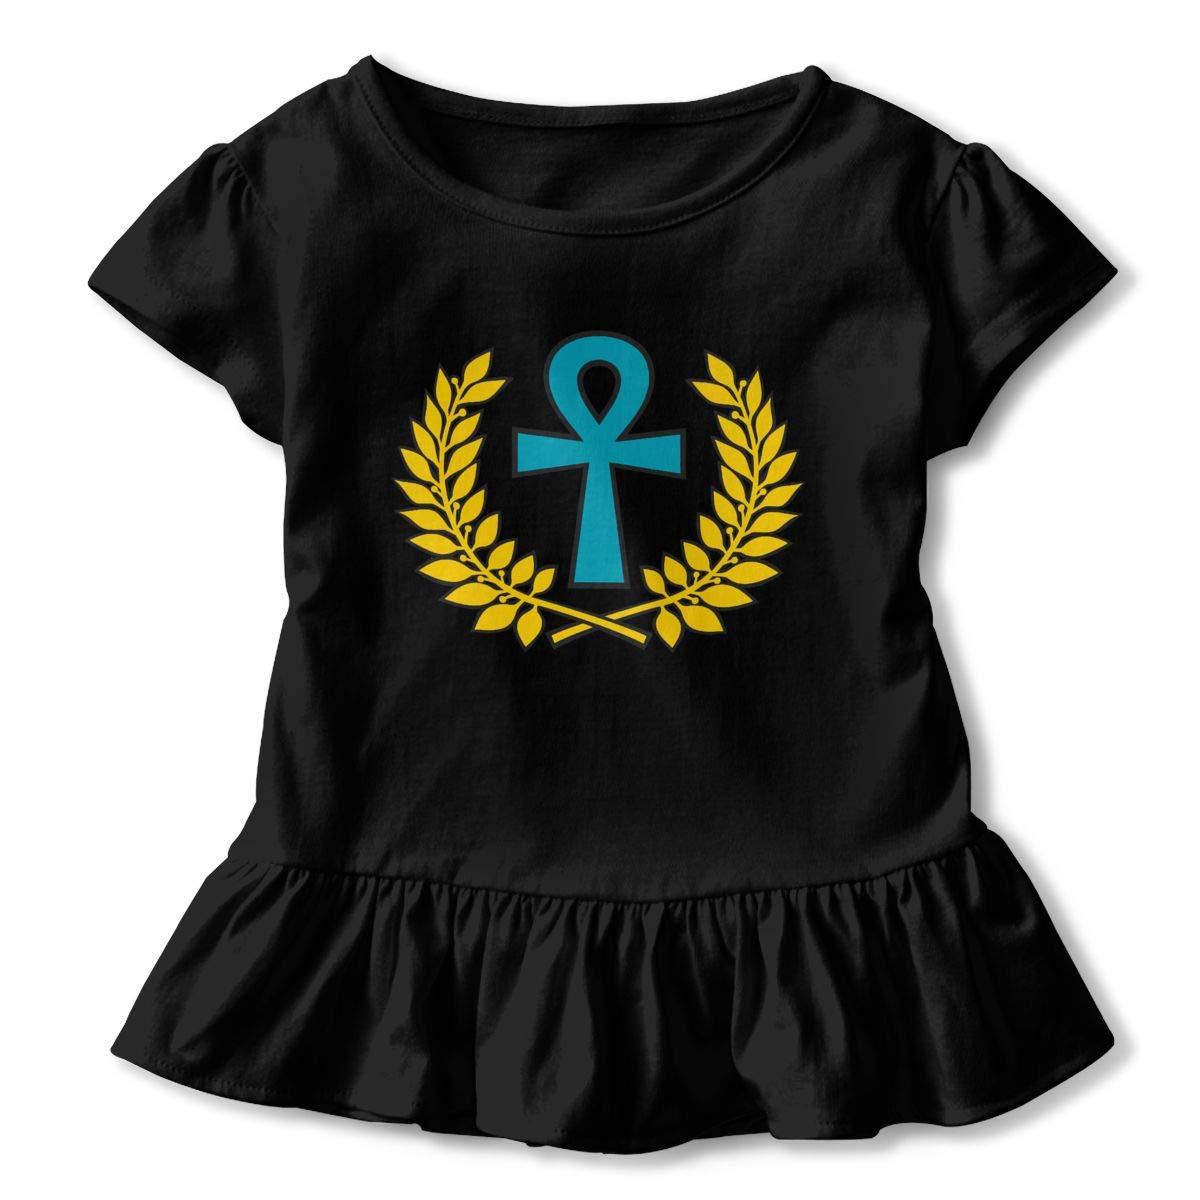 CZnuen Ancient Egyptian Ankh Golden 2-6T Baby Girls Cotton Jersey Short Sleeve Ruffle Tee